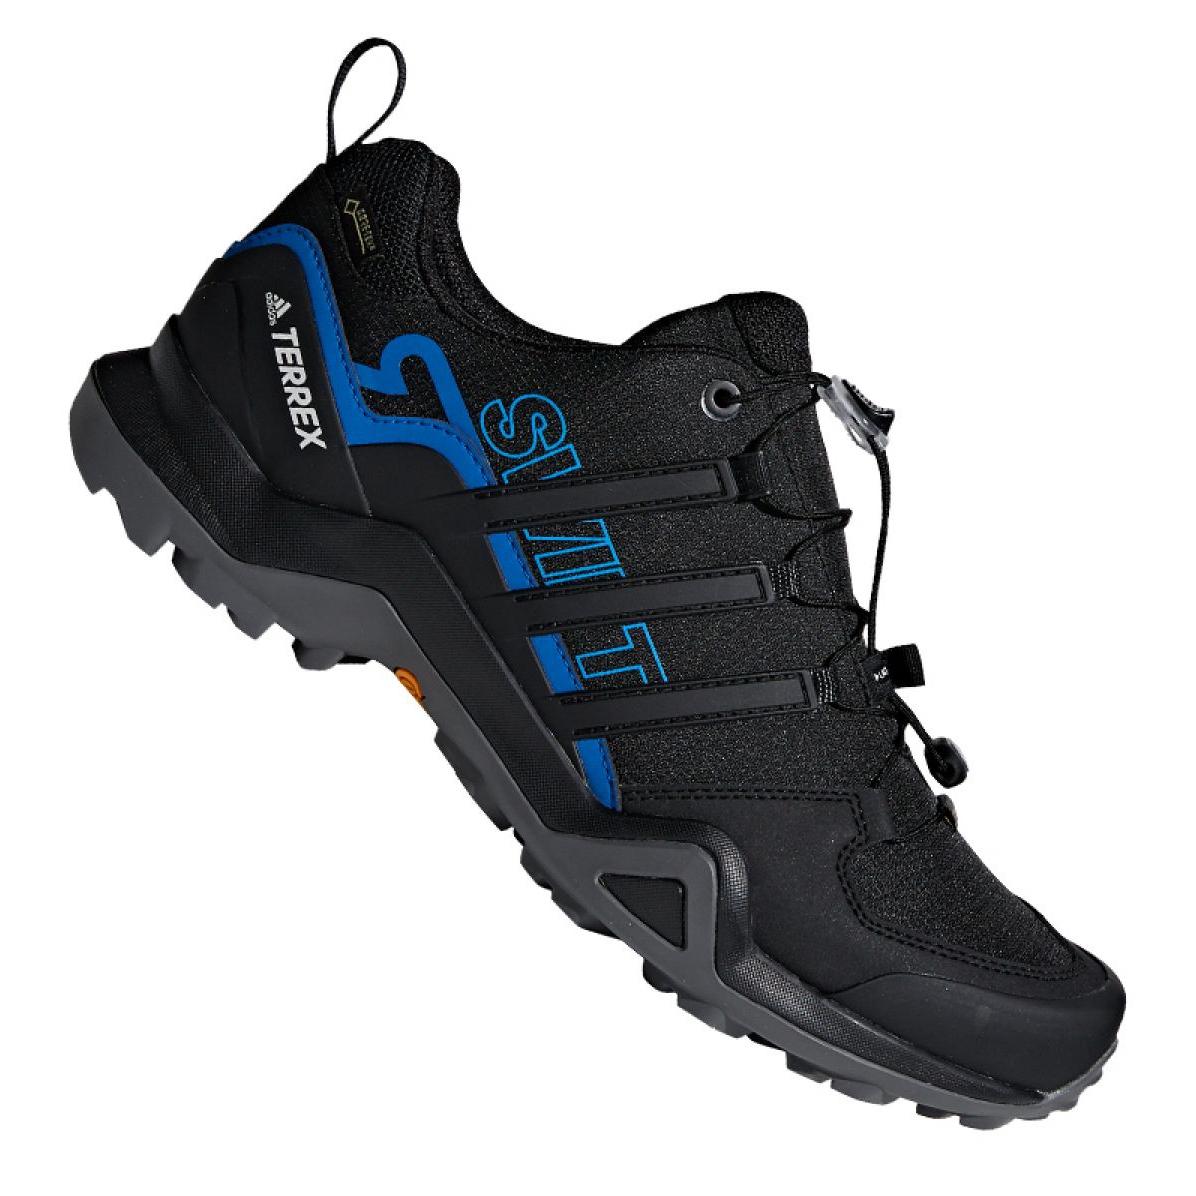 competitive price 2ce13 7c96b Dettagli su Nero Scarpe da trekking adidas Terrex Swift R2 Gtx M AC7829